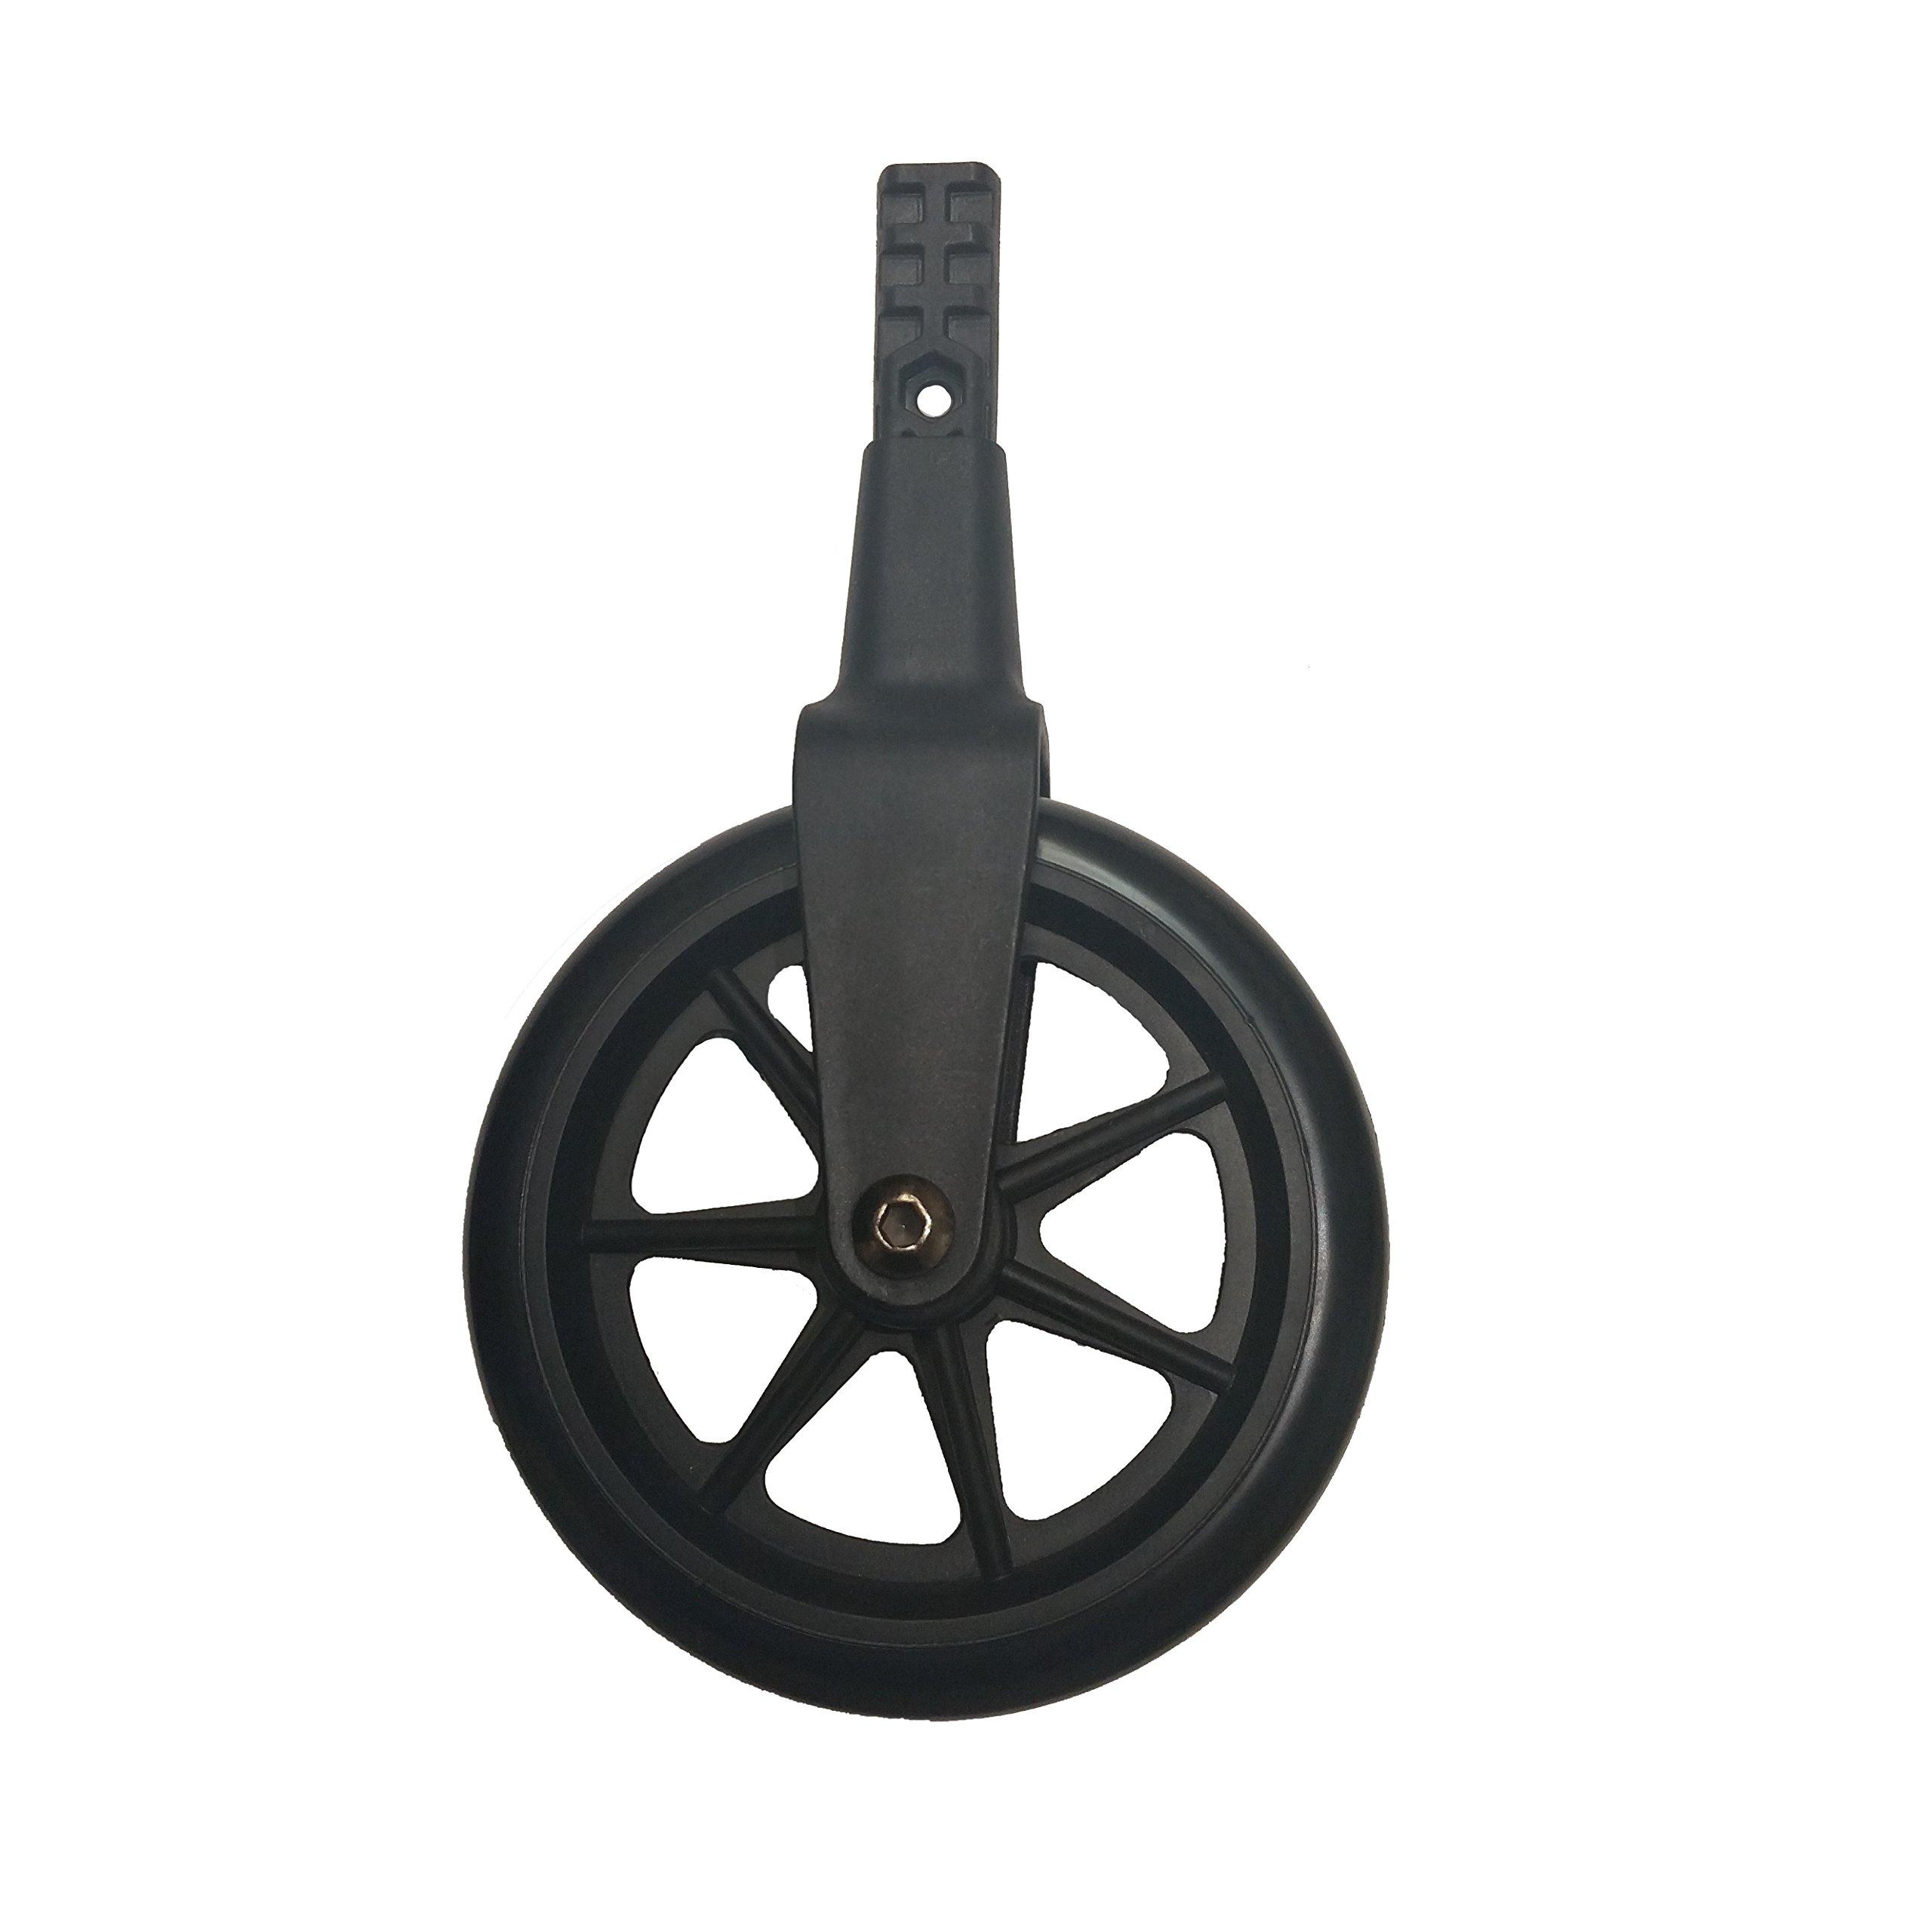 Standers Non-Swivel Wheel Kit for Ez Fold N' Go Walker and Space Saver Walker, Black, 2 Count